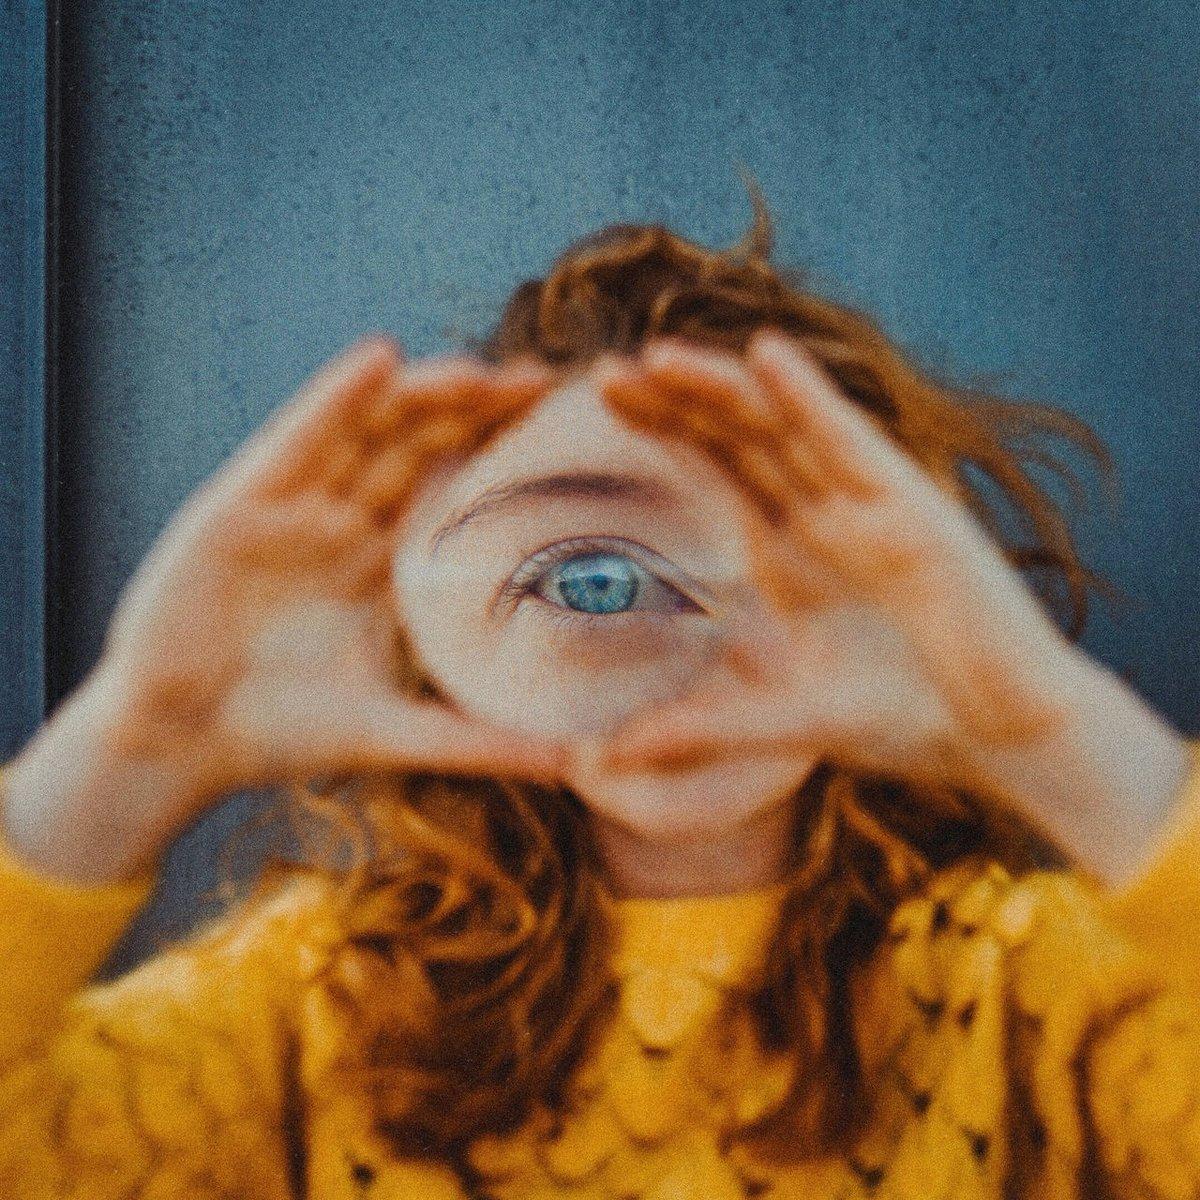 She's got an eye on you 👁️  Great new portrait work by @aufzehengehen.de recently uploaded to EyeEm. https://t.co/7W0syOXKyo https://t.co/a4vCWBQoxn